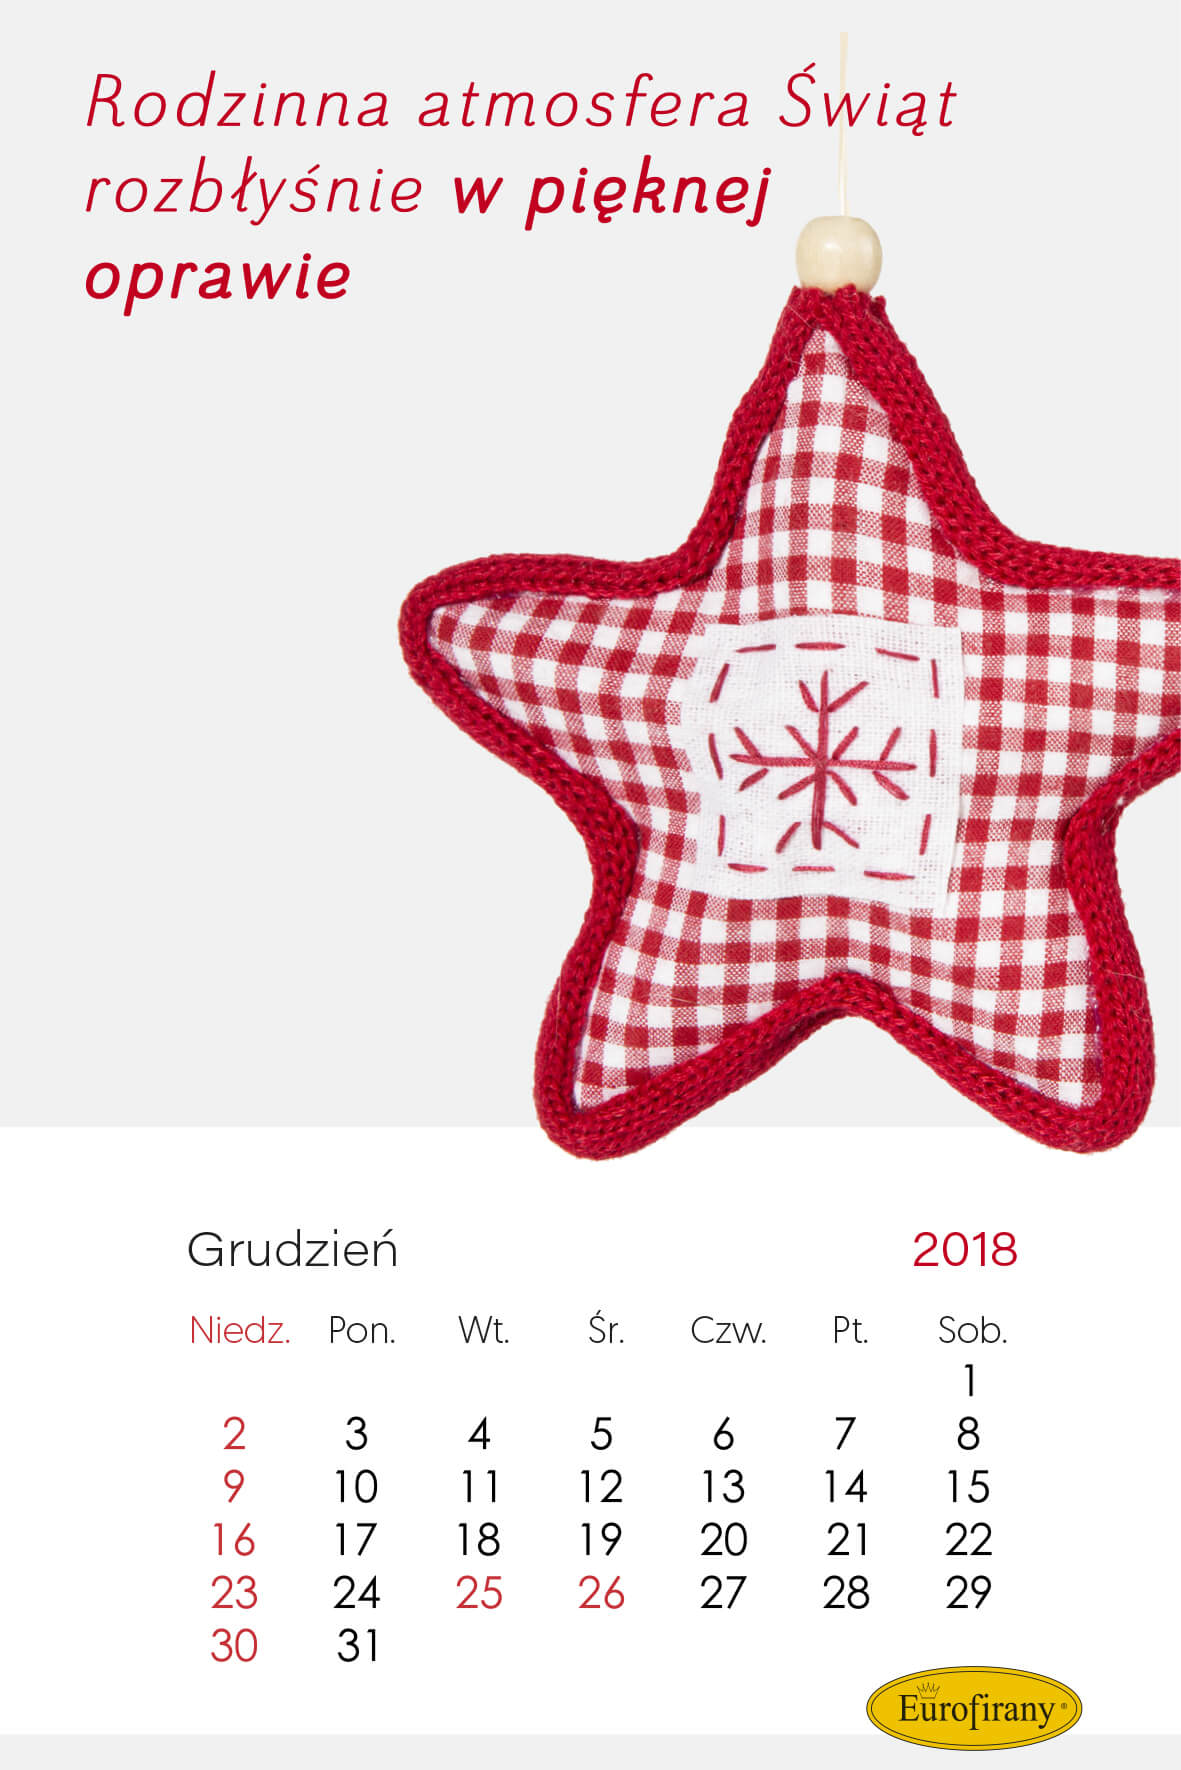 grudzień 2018 eurofirany